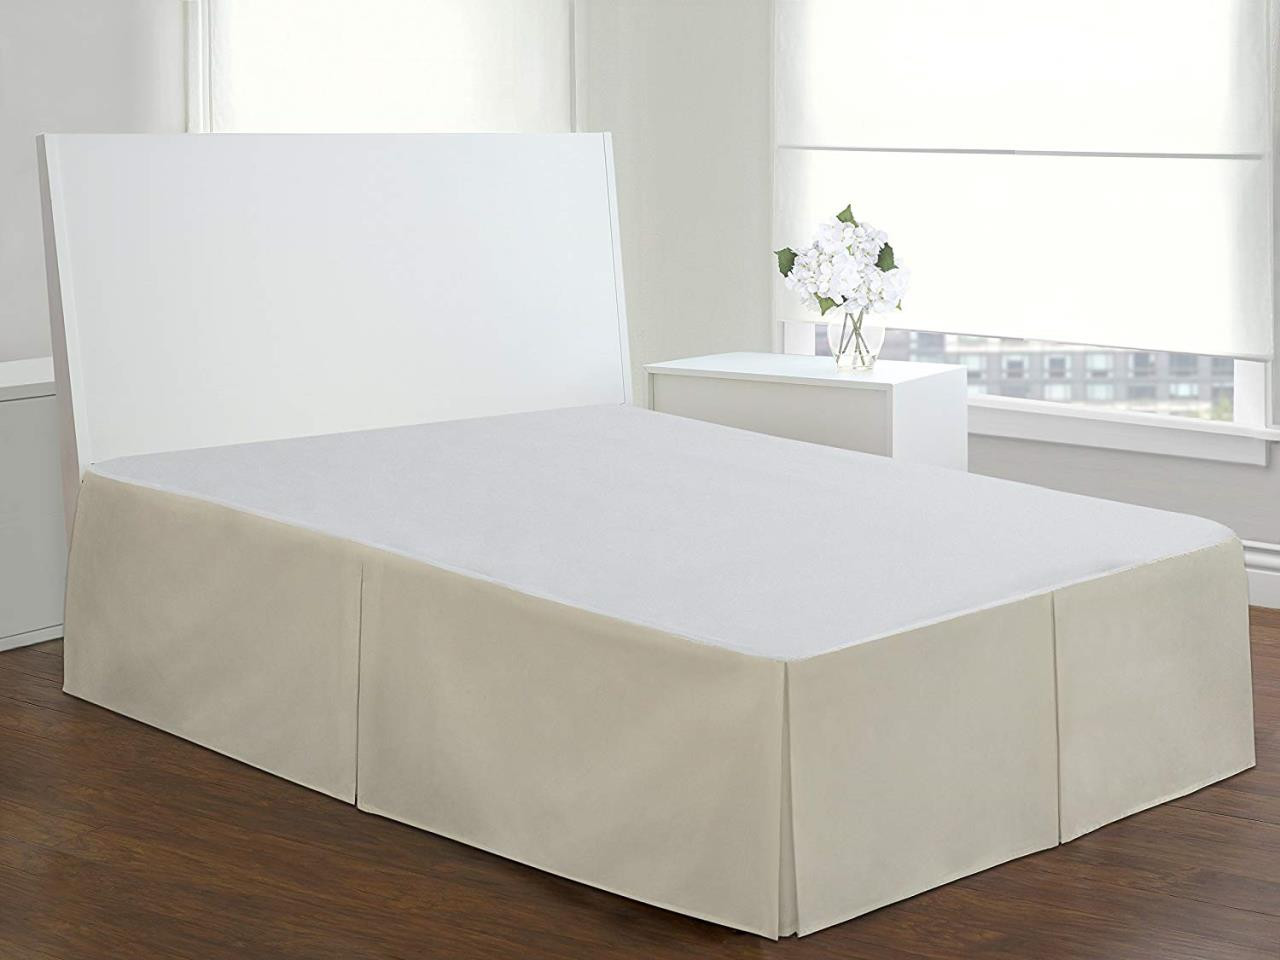 Poplin Tailored Bed Skirt - 010482003086